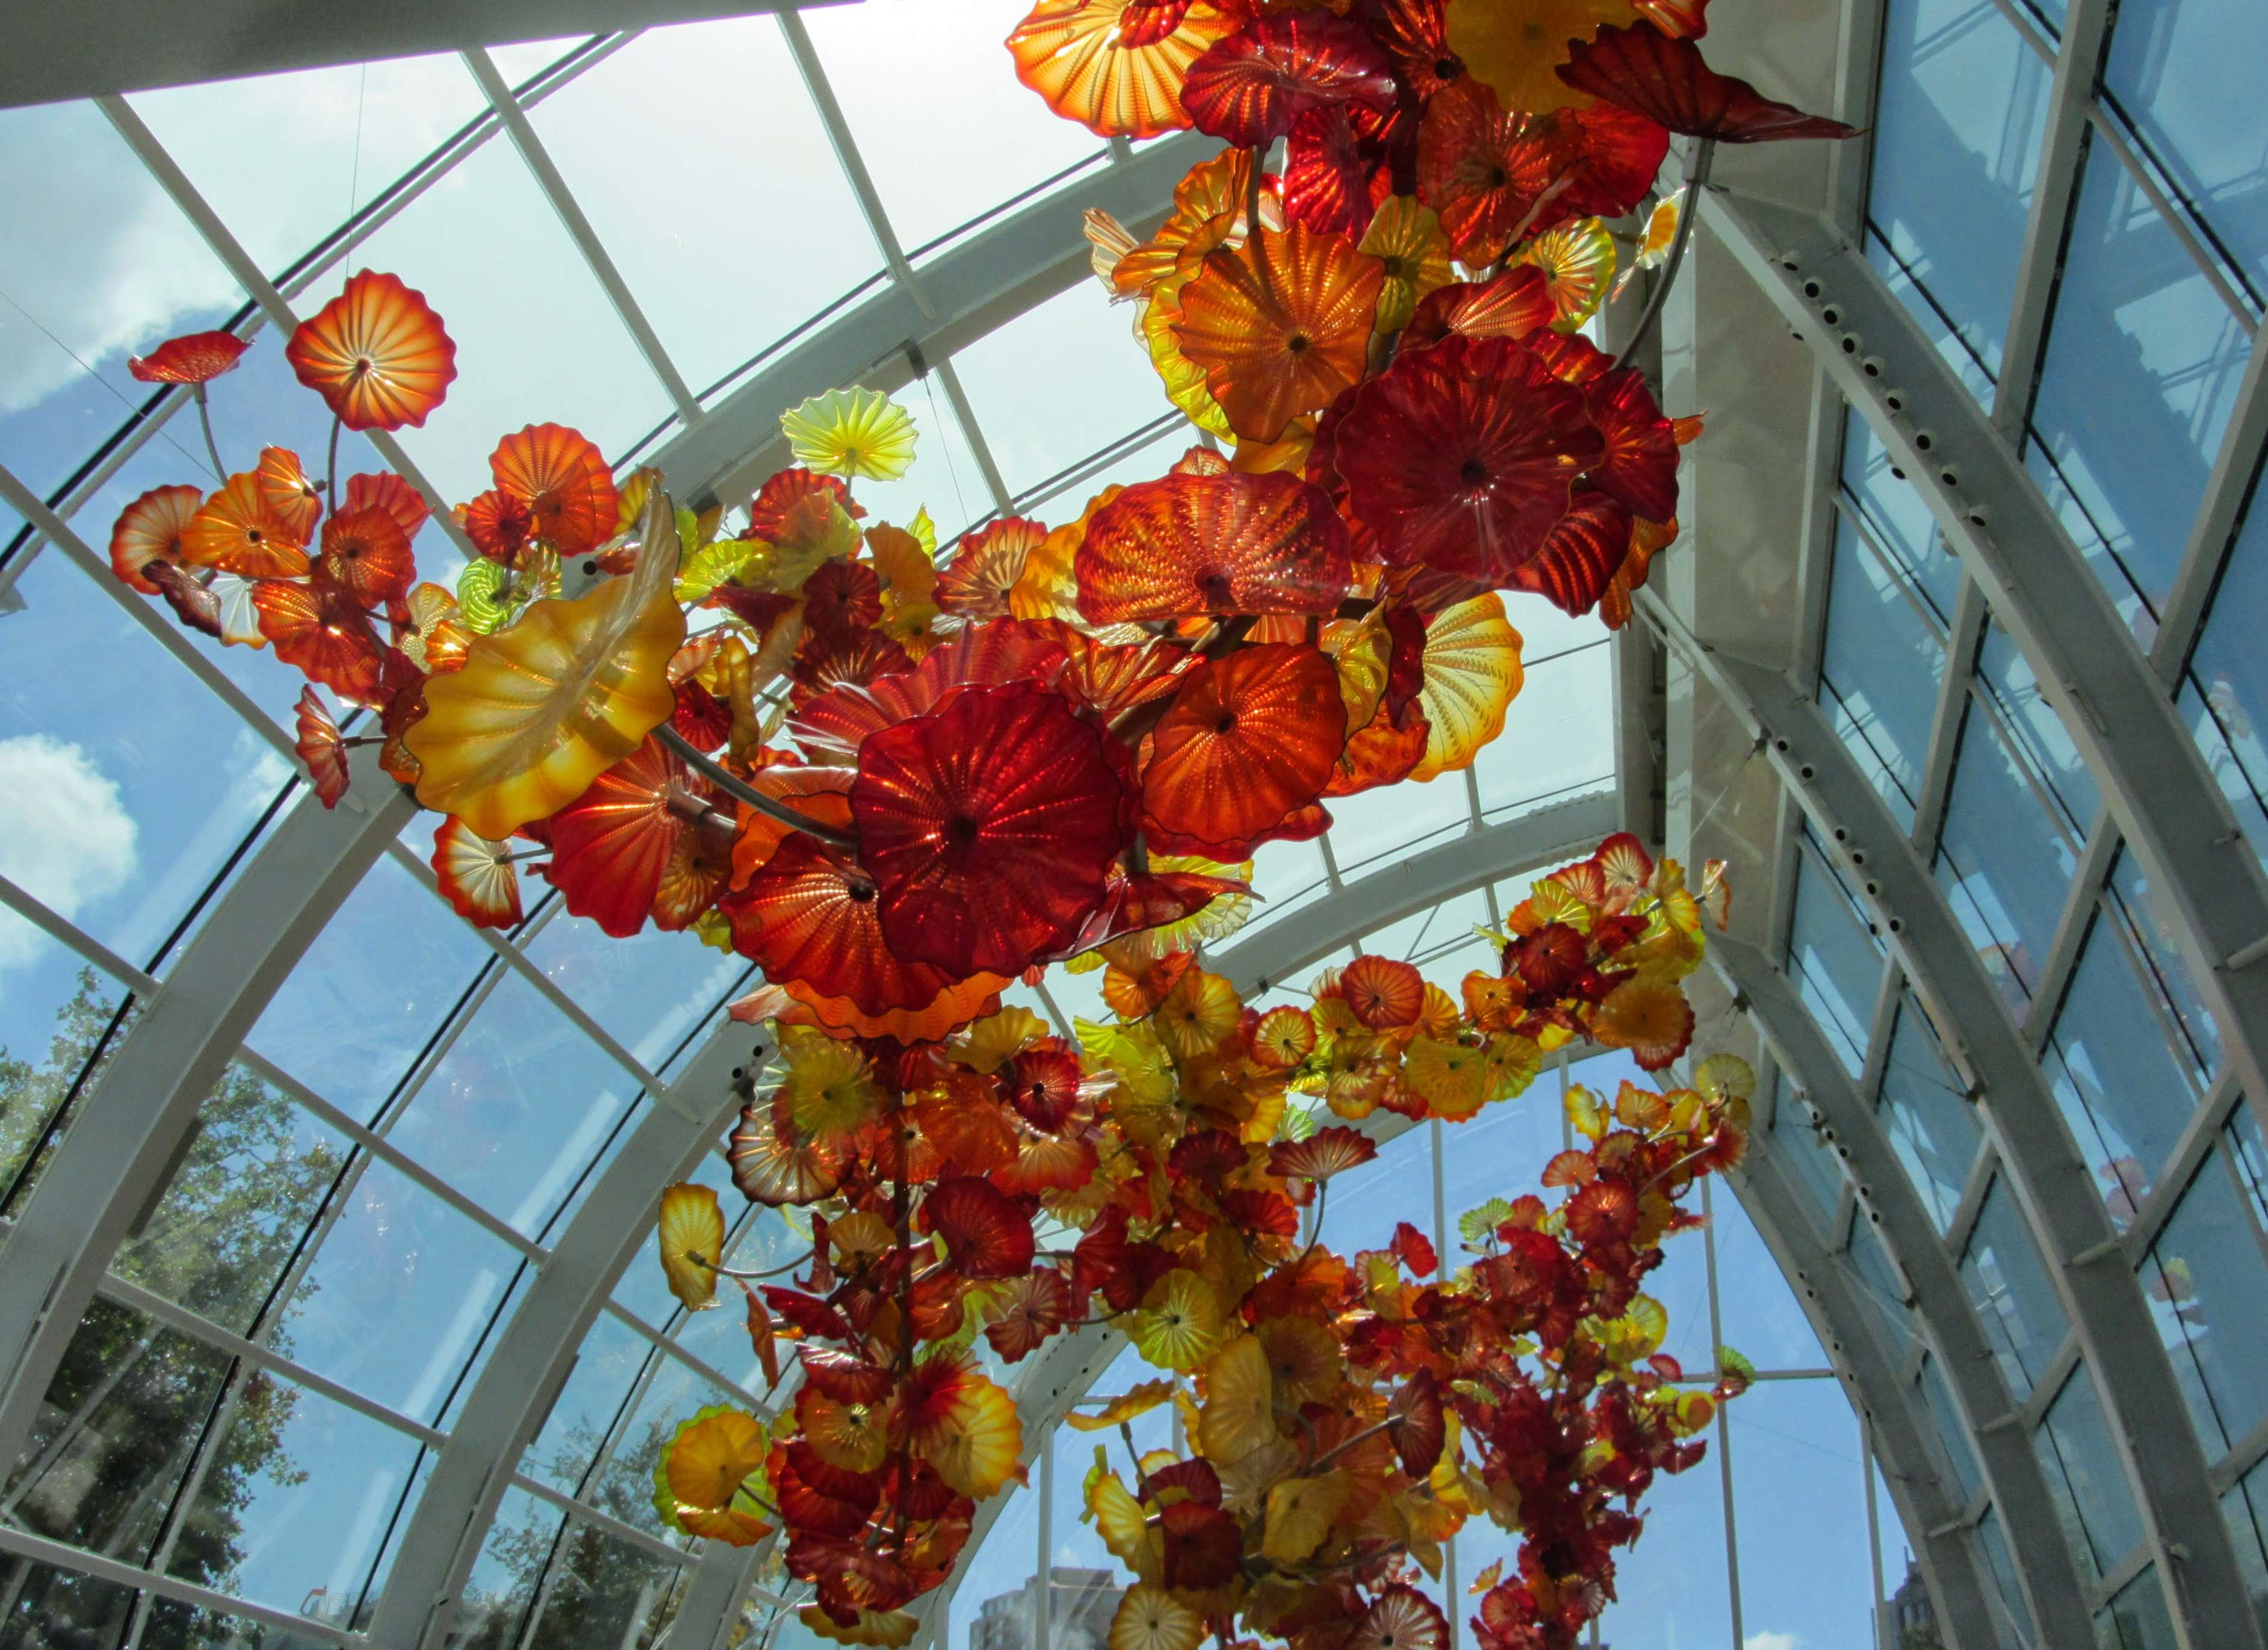 Seattle Chihuly Garden Amp Glass Exhibit Diane Uke Shares